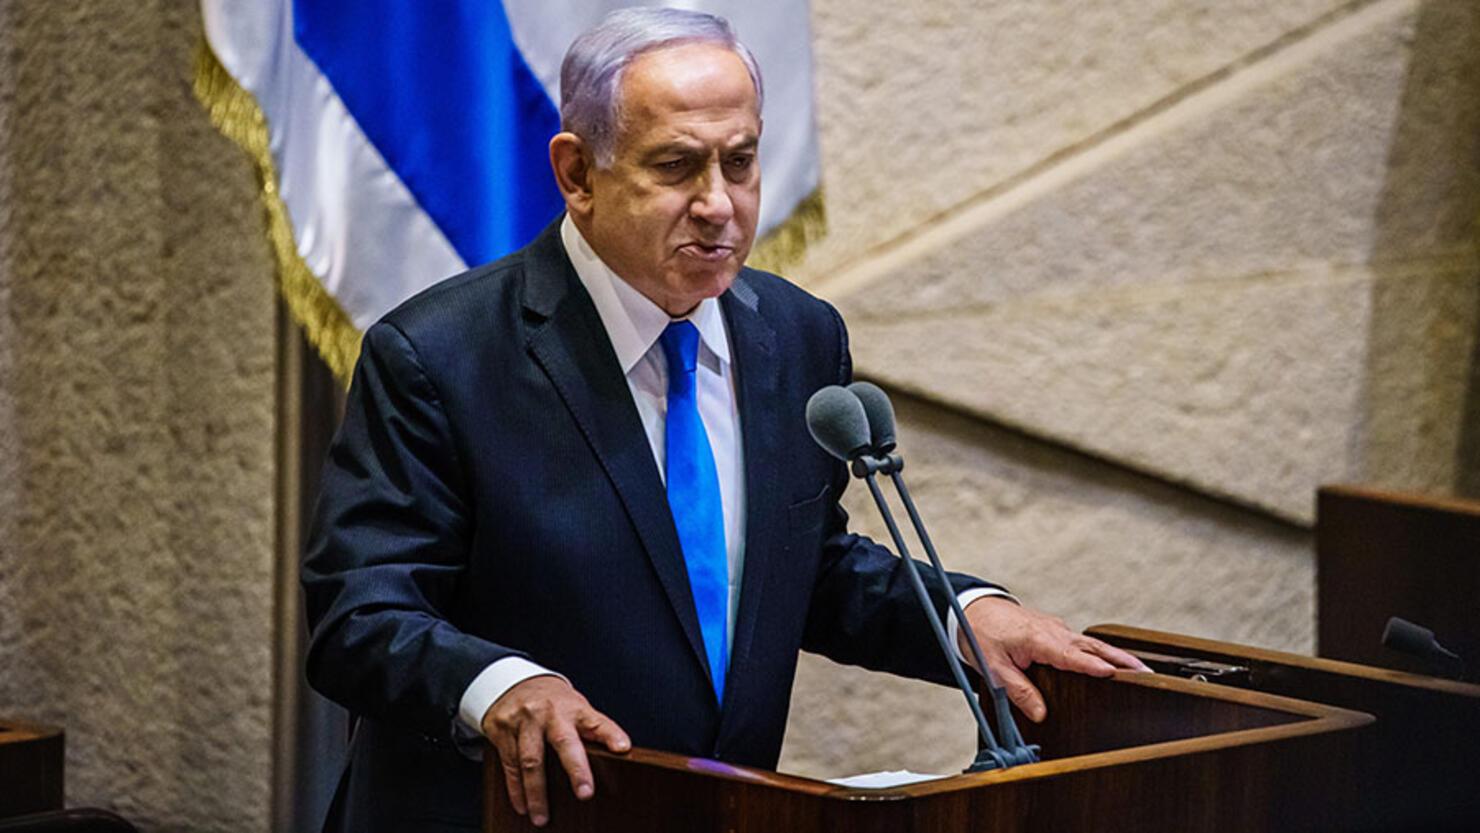 ISRAEL PM BENJAMIN NETANYAHU VOTED OUT